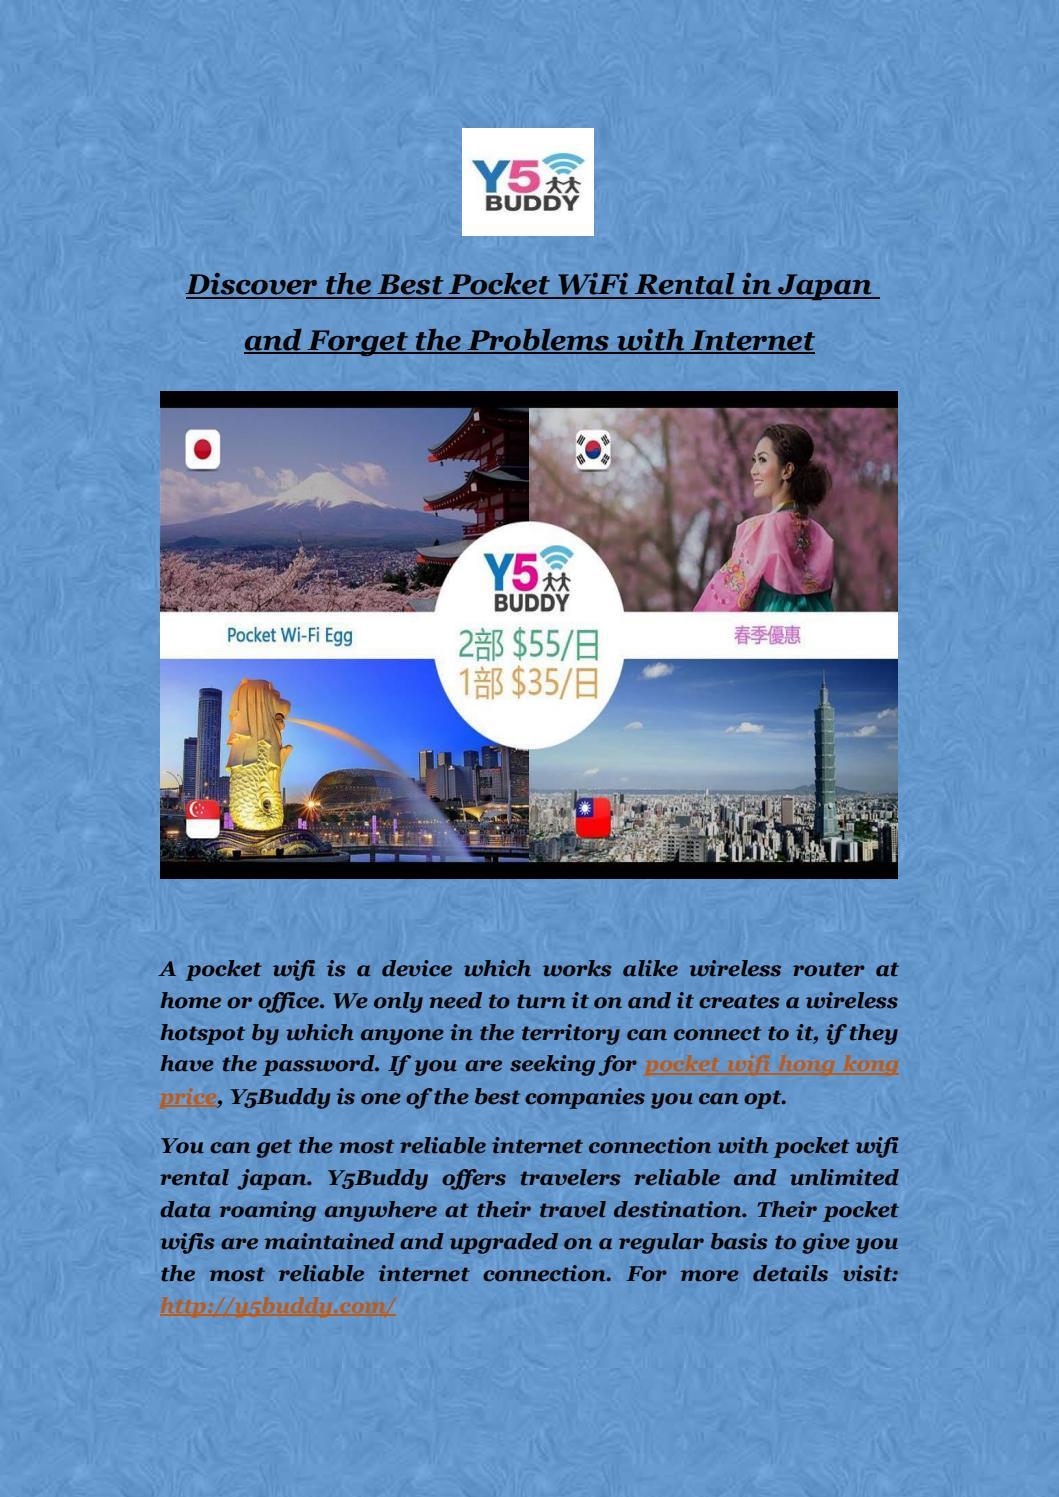 Rent the Best Pocket WiFi Rental in Japan by y5 buddy - issuu